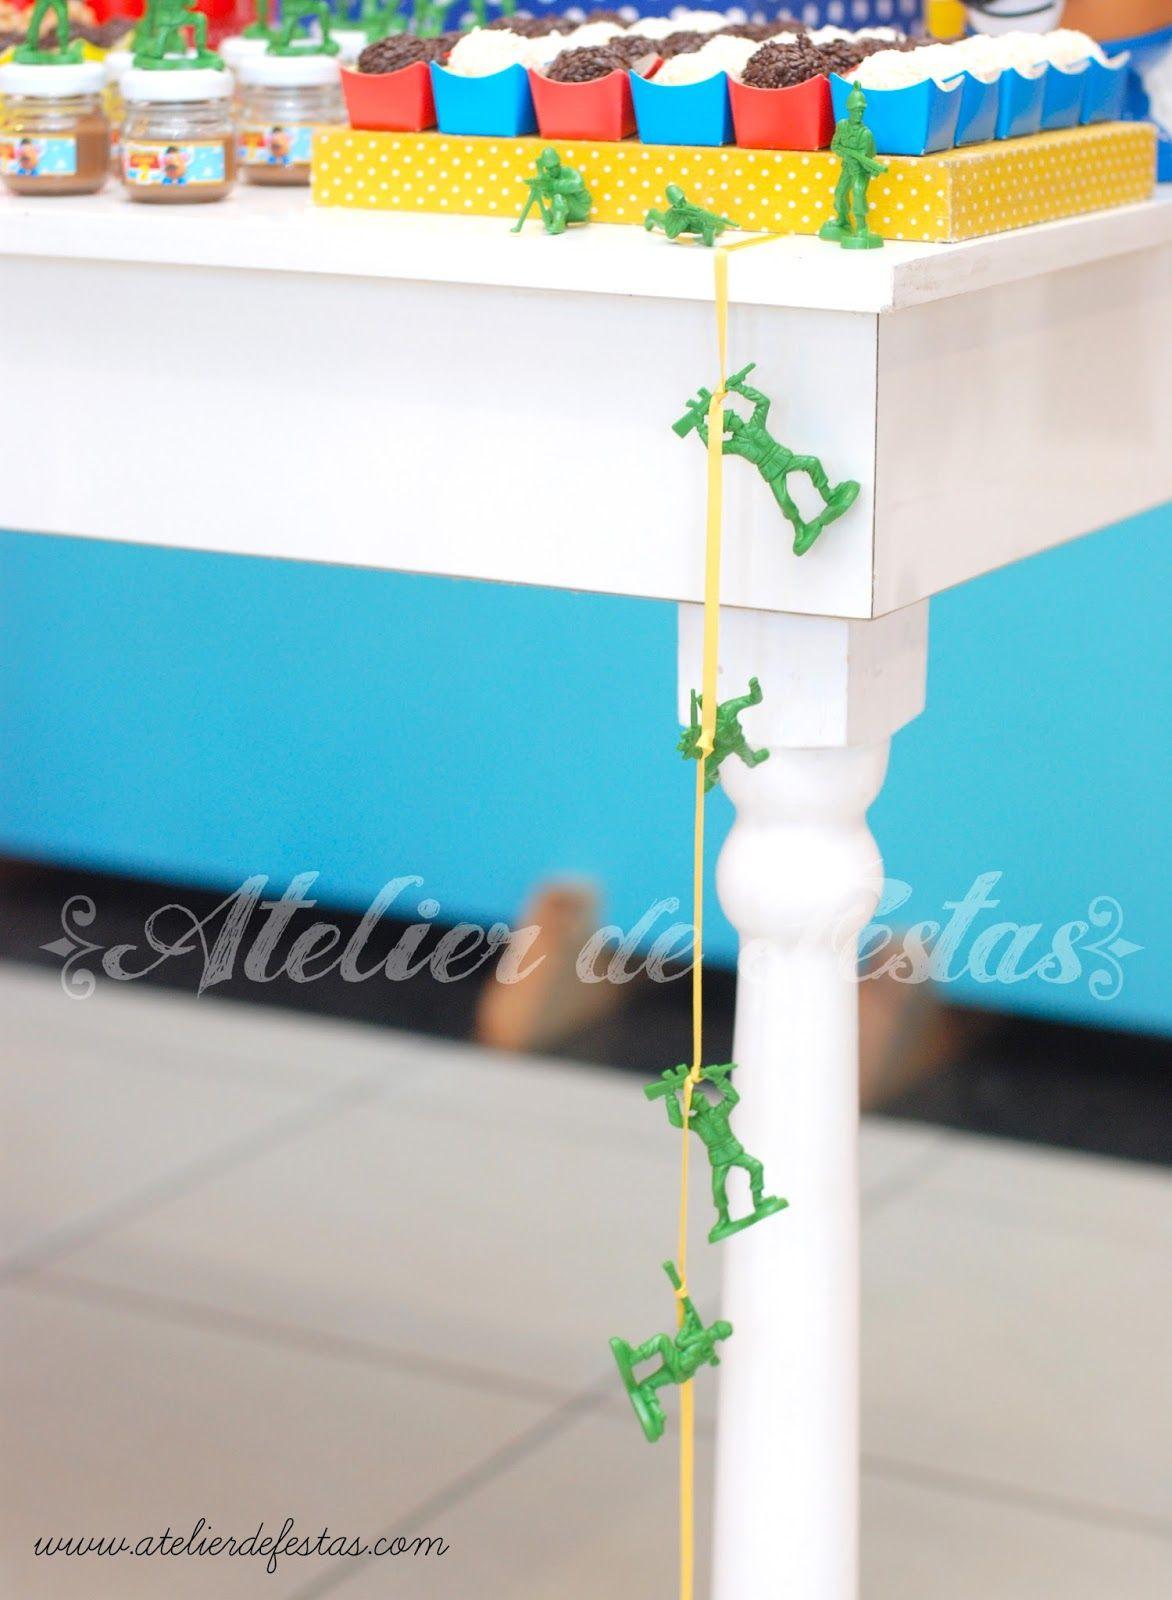 Atelier de Festas: Toy story